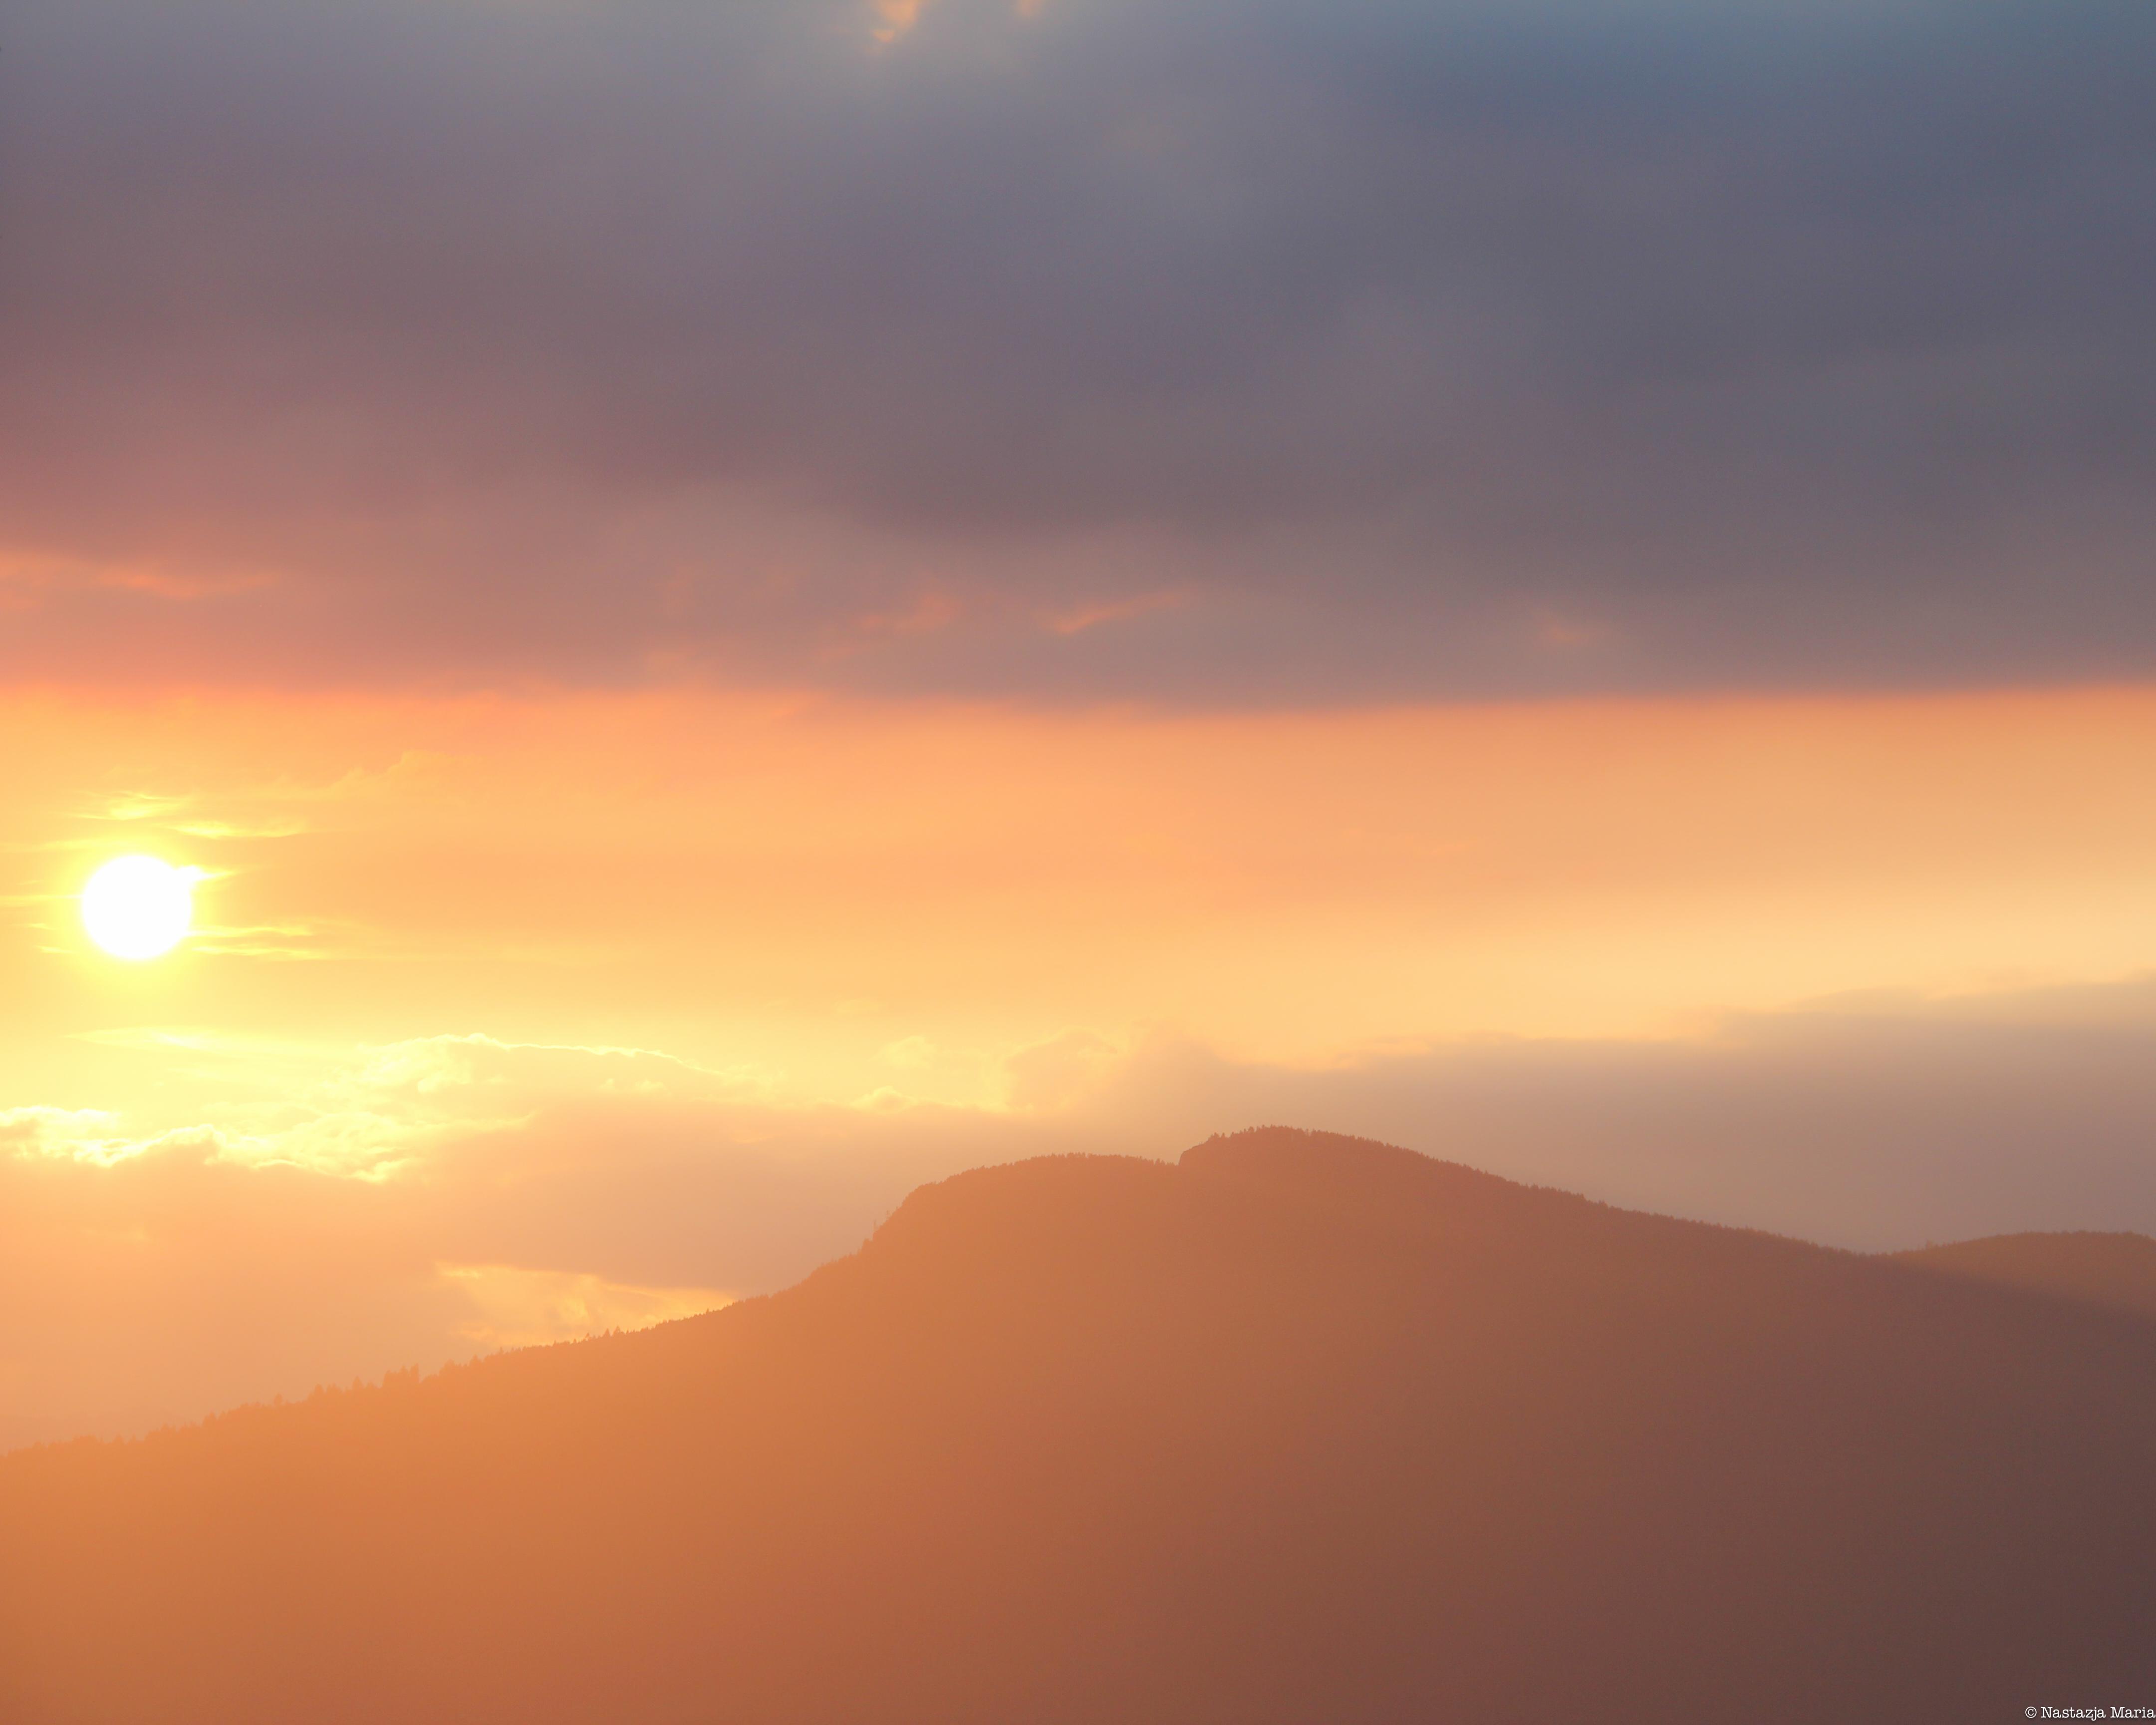 Sunset from Maple Ridge 8 x 10.jpg